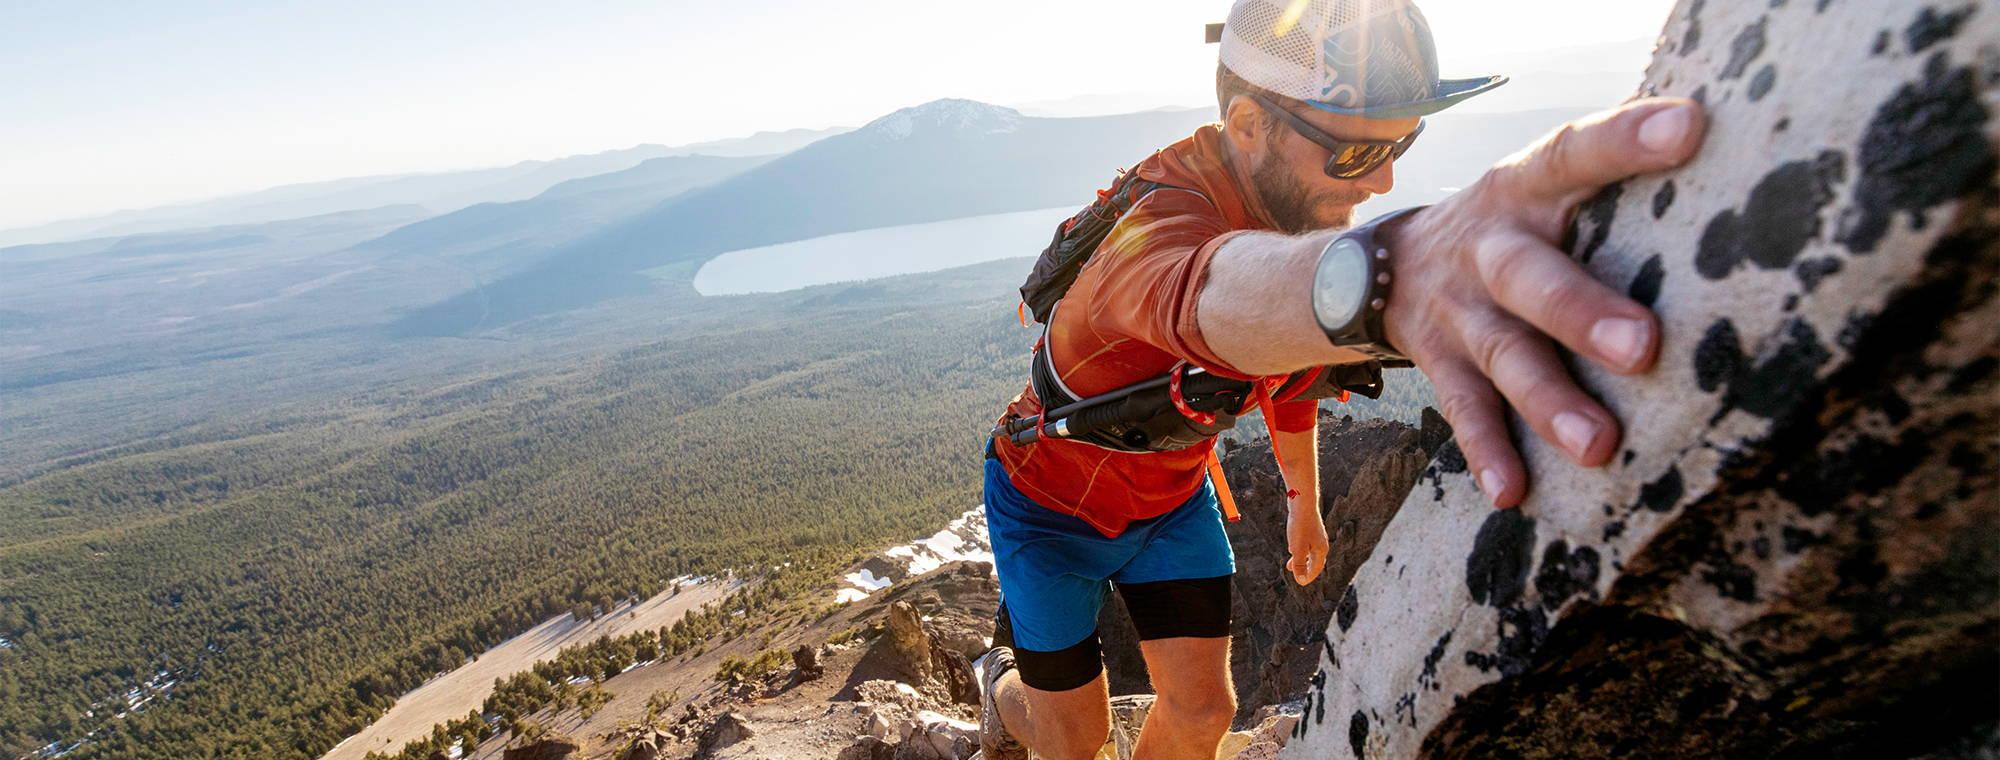 NW Alpine Ambassador Jason Hardrath Mountain Running Southern Oregon